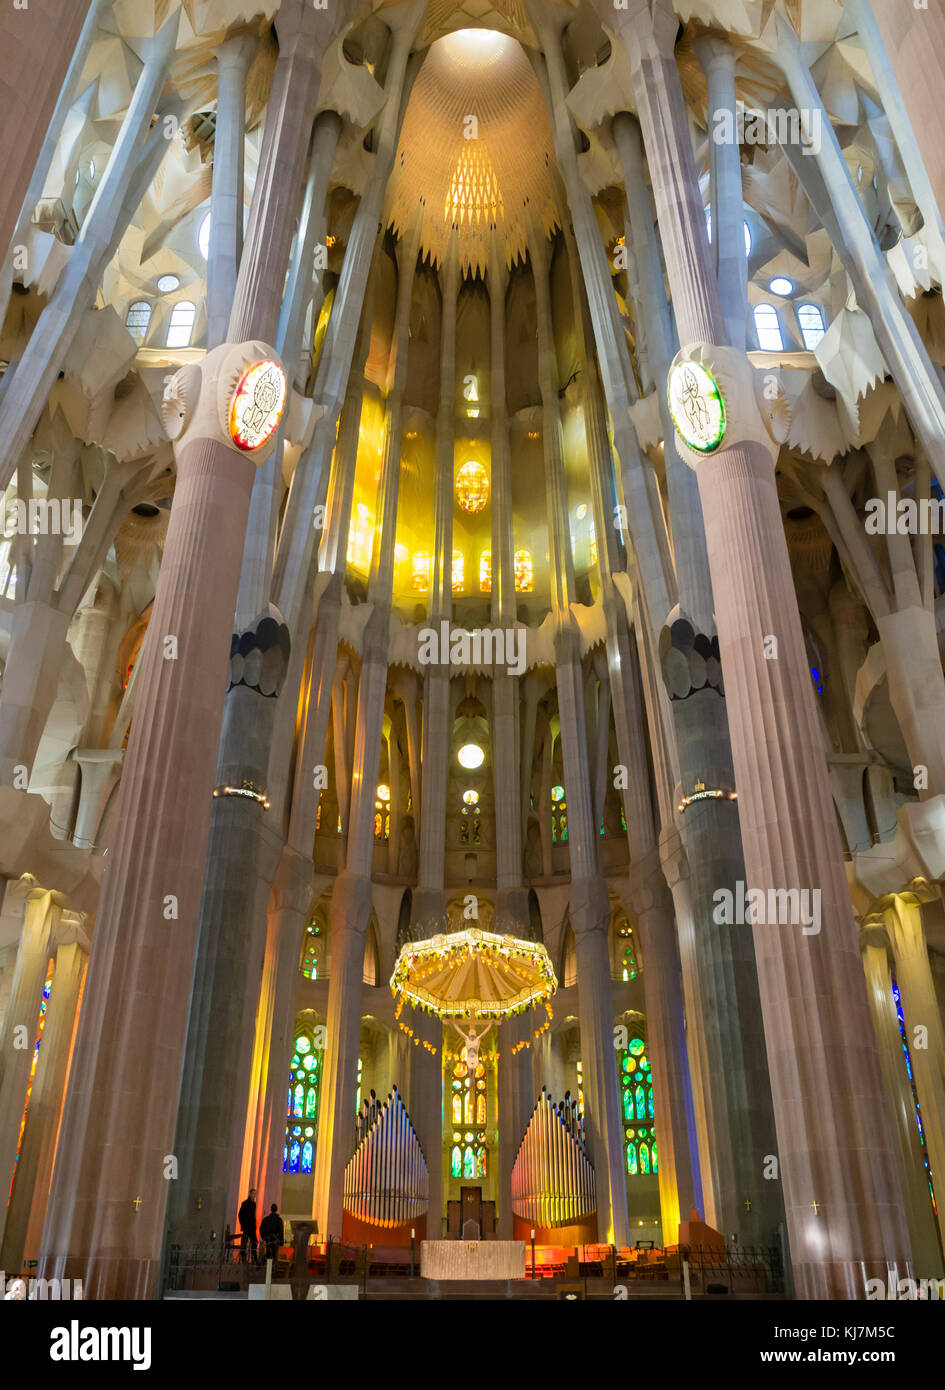 Barcelona, Spain - 11 Nov 2016: Spectacular interior of Barcelona's Sagrada Familia cathedral. - Stock Image